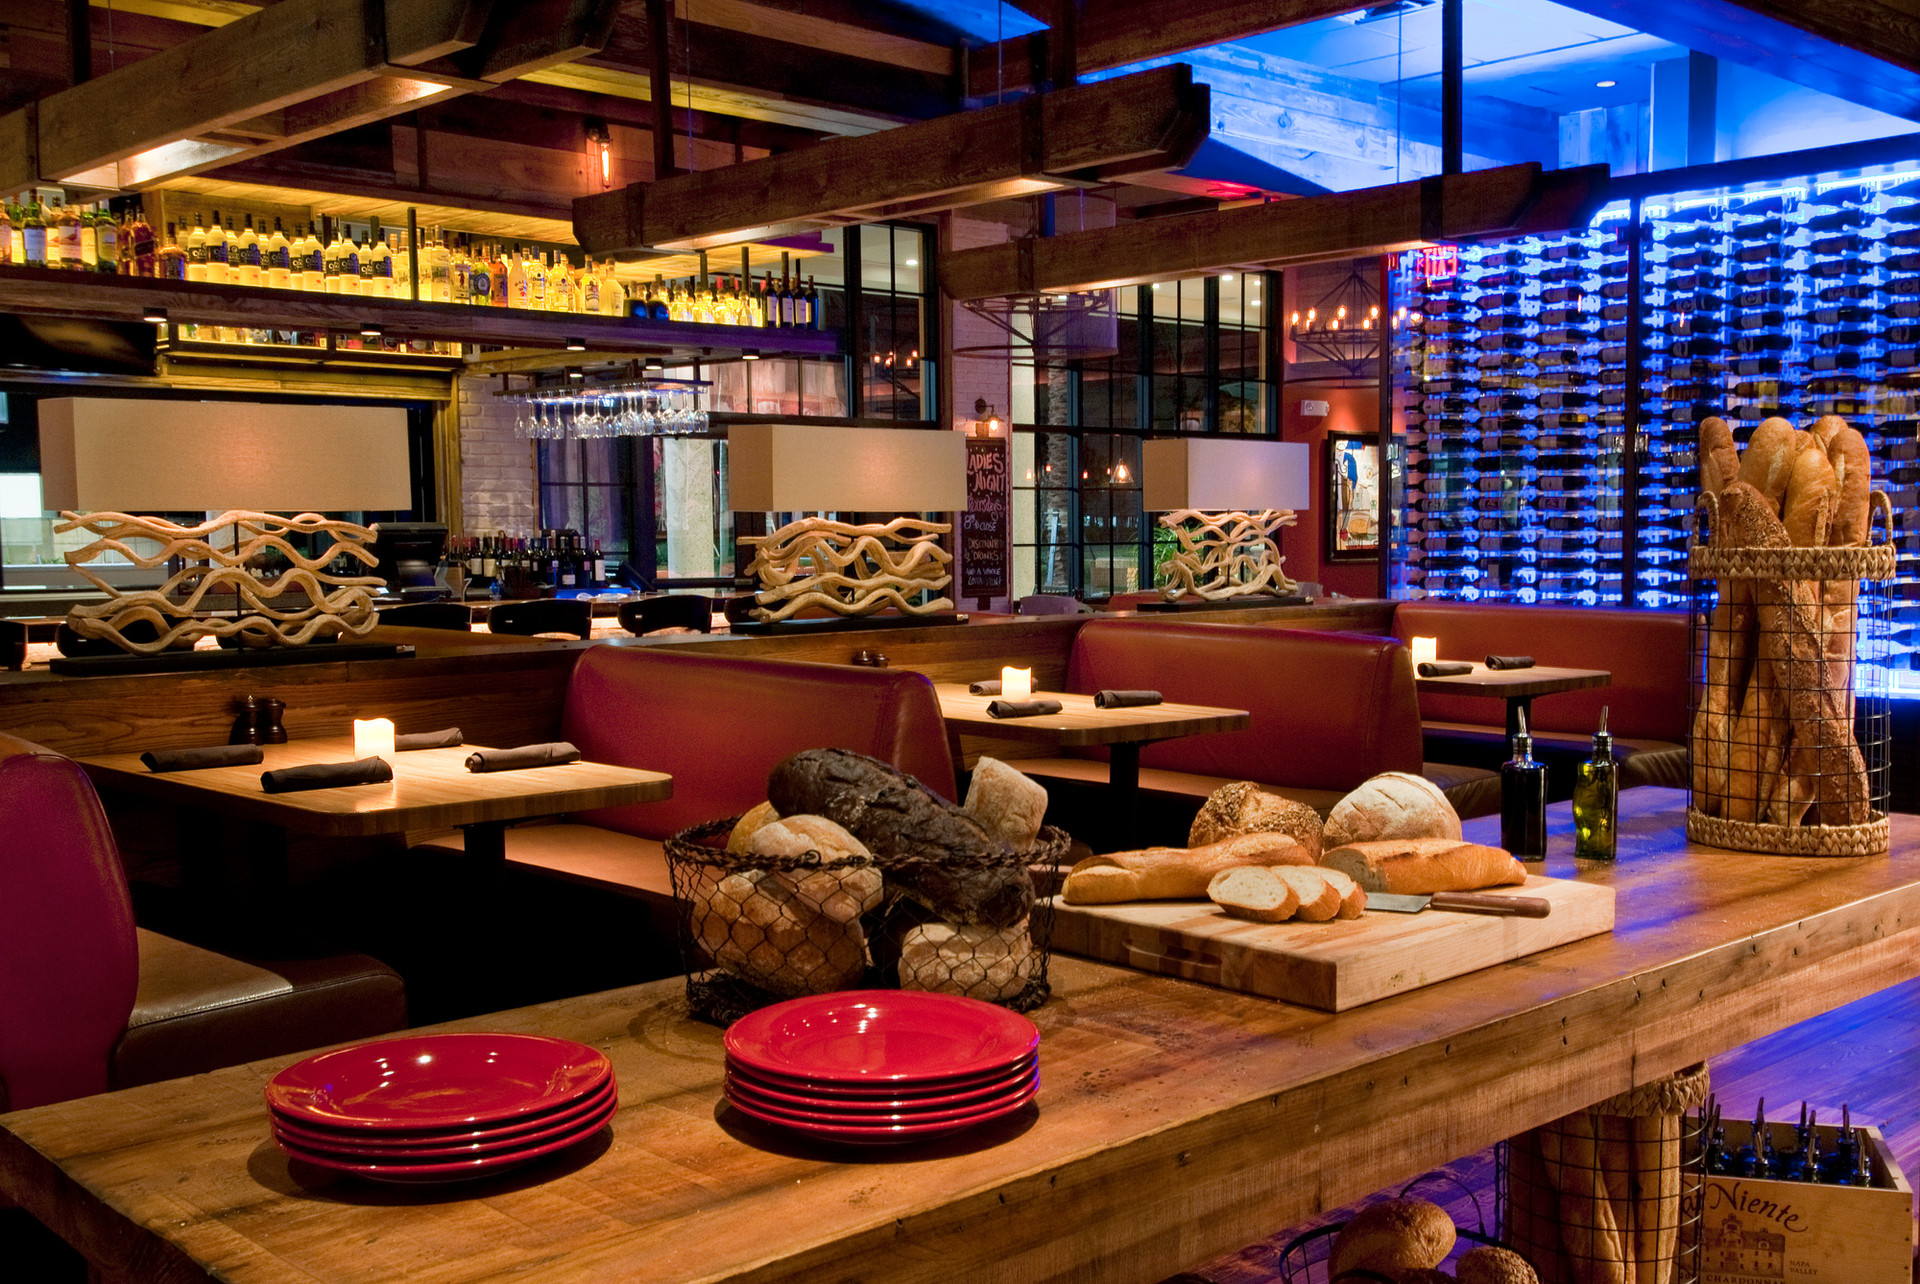 Bread station & wine display.jpg